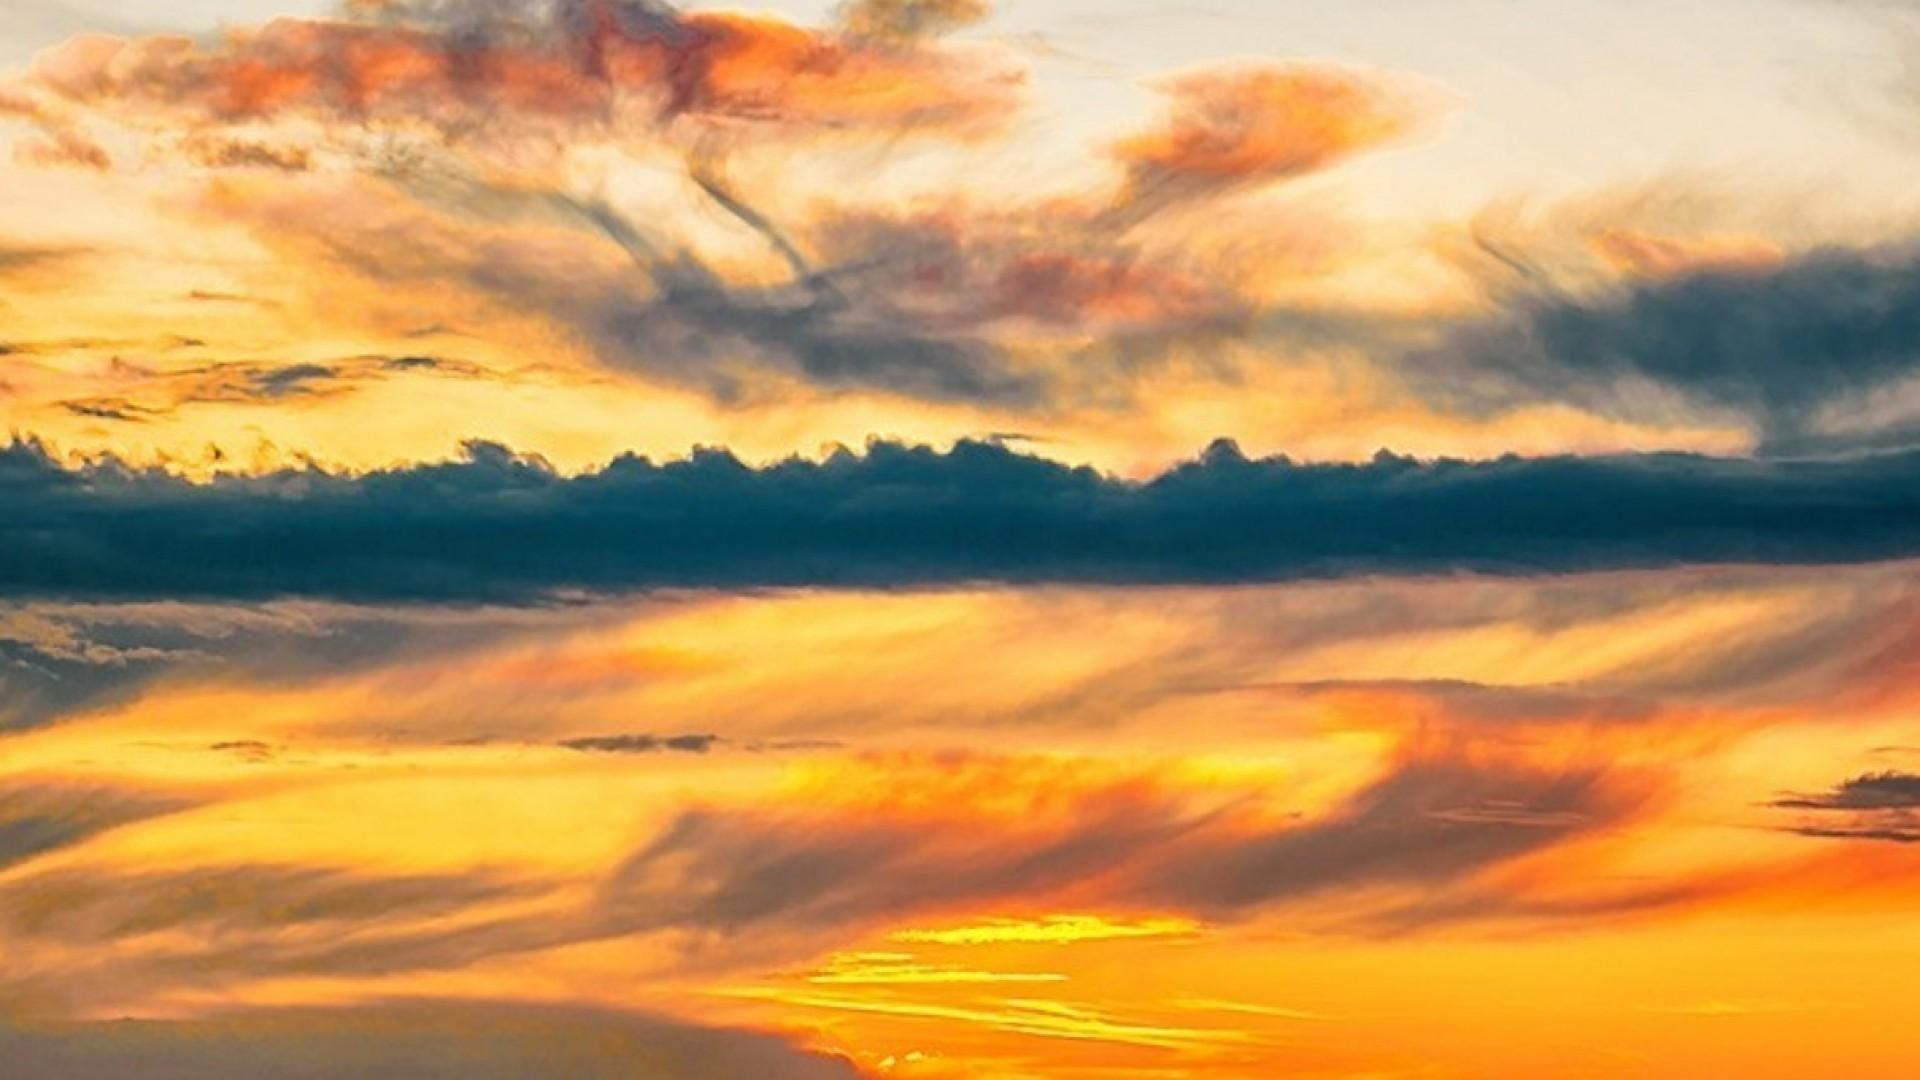 15 закатов фотографа Александра Антощенко